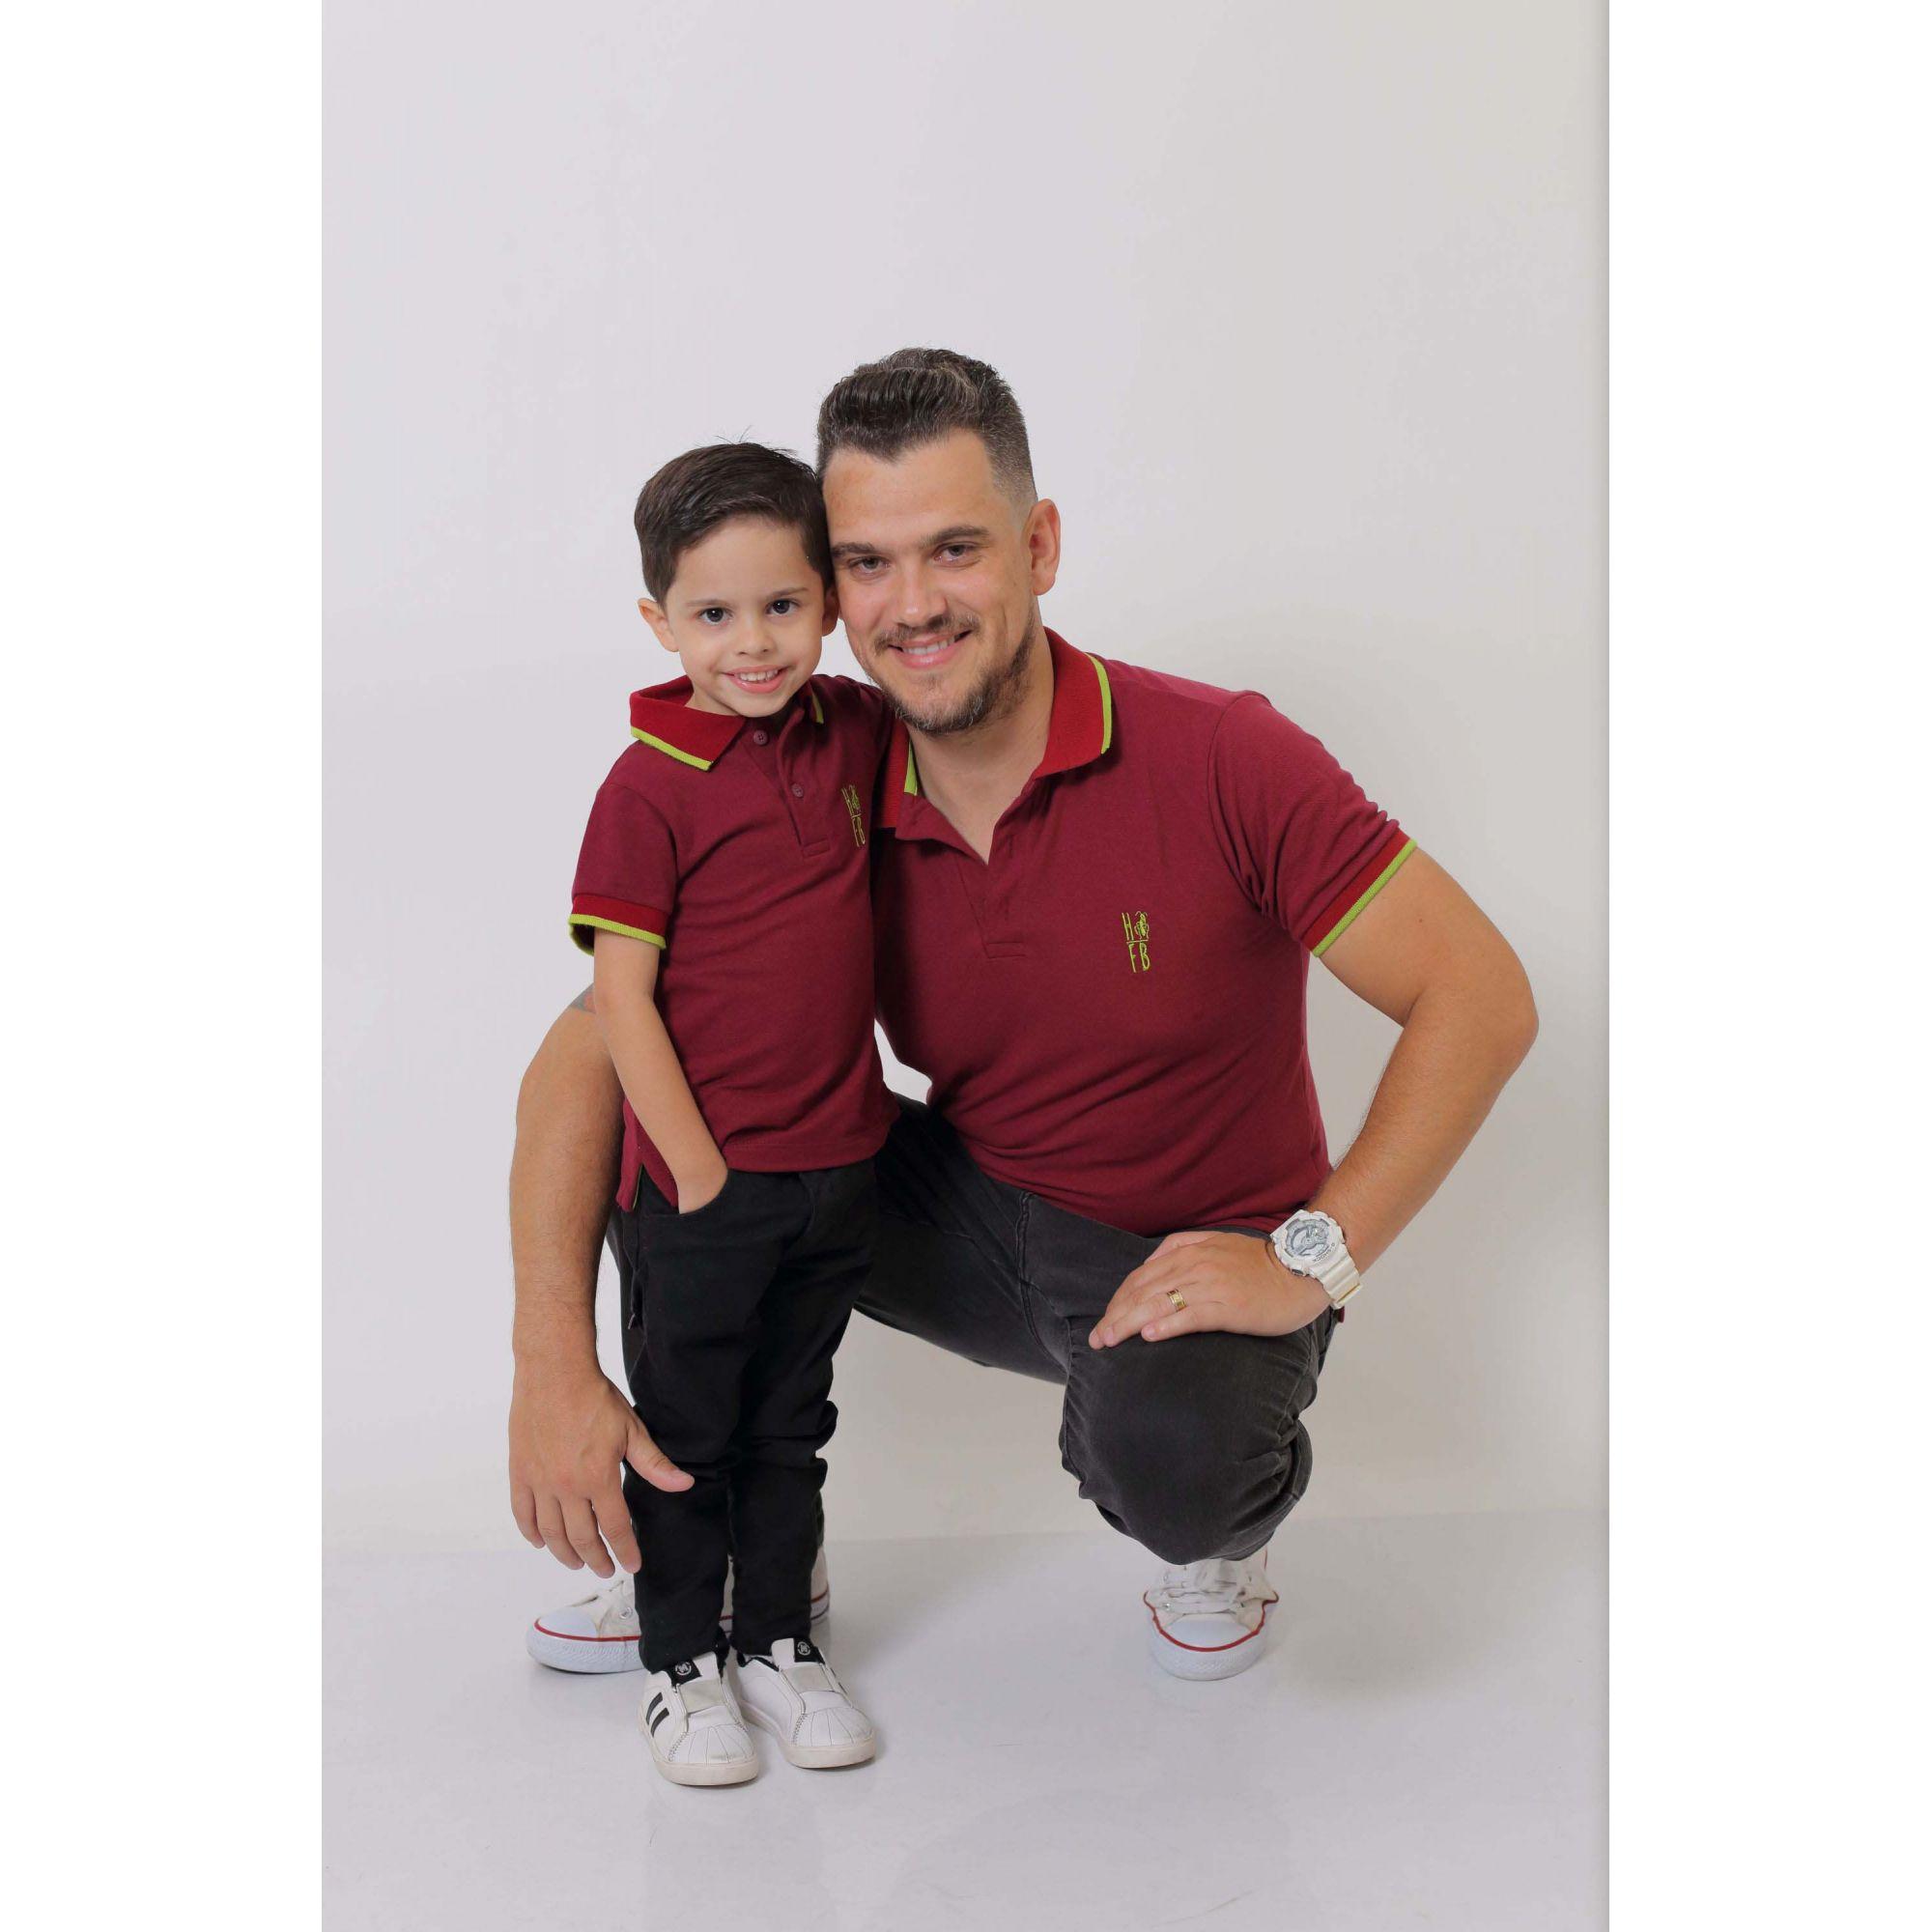 PAI E FILHO > Kit 02 Camisas ou Body Polo Bordo  [Coleção Tal Pai Tal Filho]  - Heitor Fashion Brazil